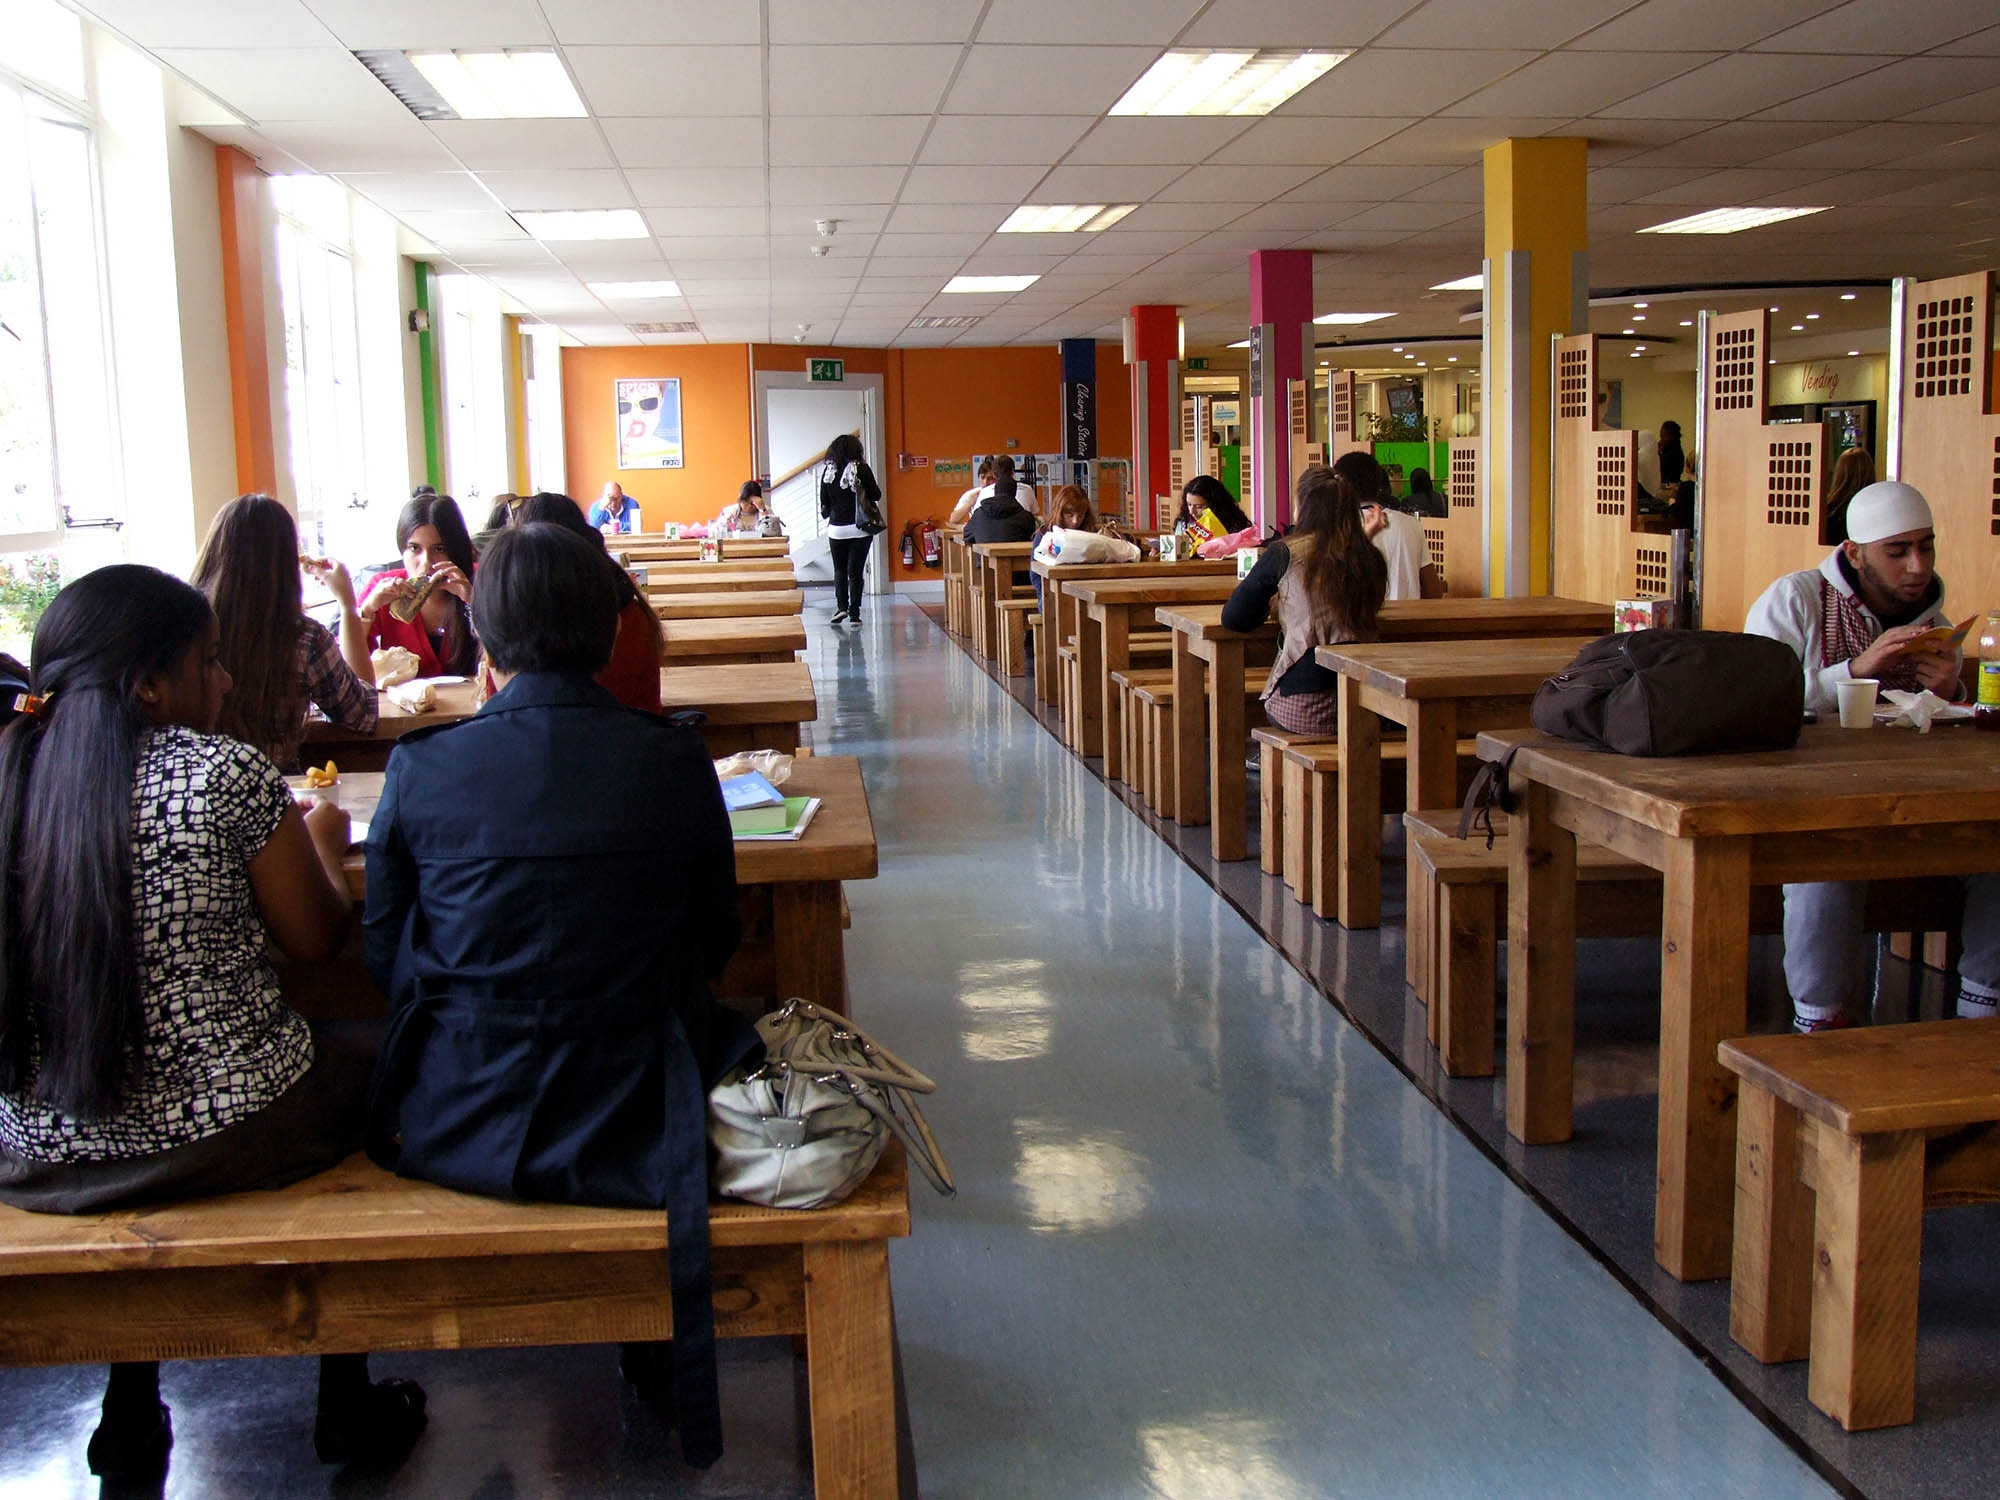 Penrhyn Road Campus At Kingston University Virtual Tour